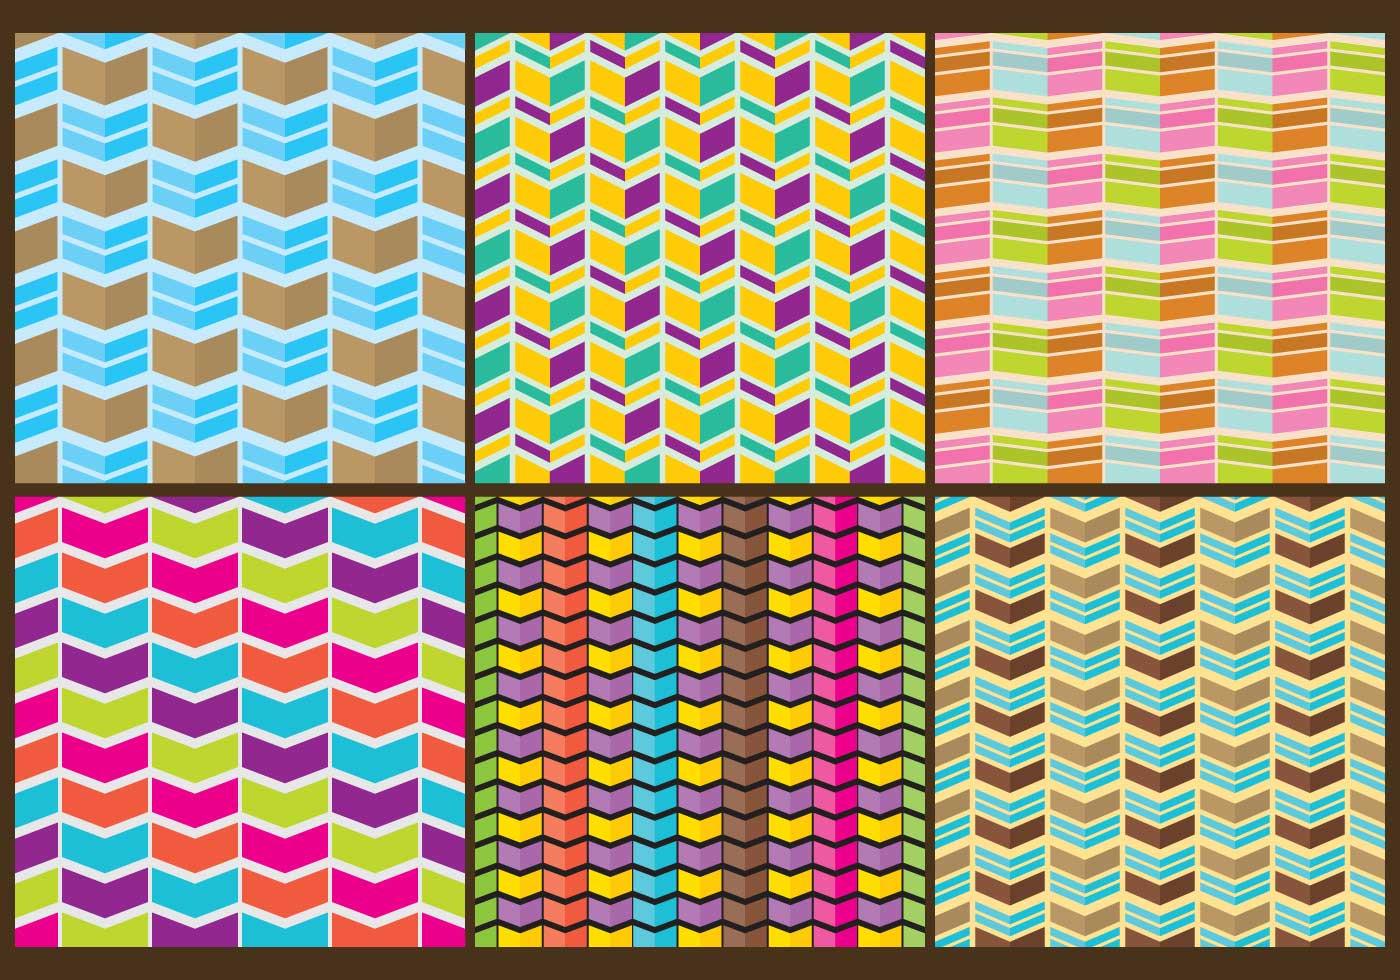 Segmented Chevron Patterns Download Free Vector Art